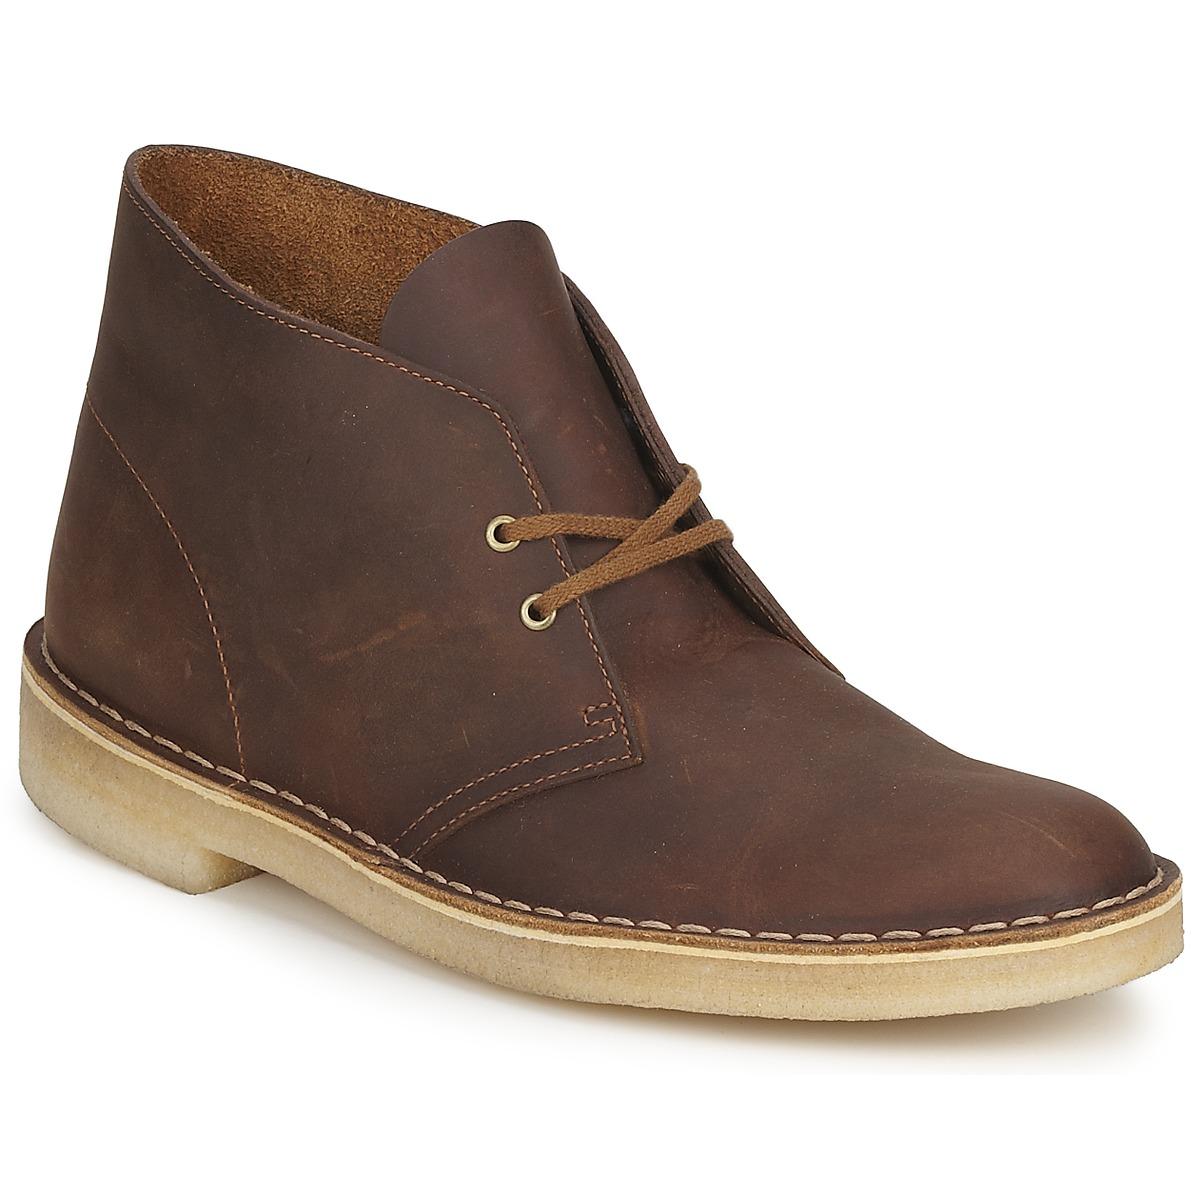 Clarks DESERT BOOT Braun - Kostenloser Versand bei Spartoode ! - Schuhe Boots Herren 103,20 €